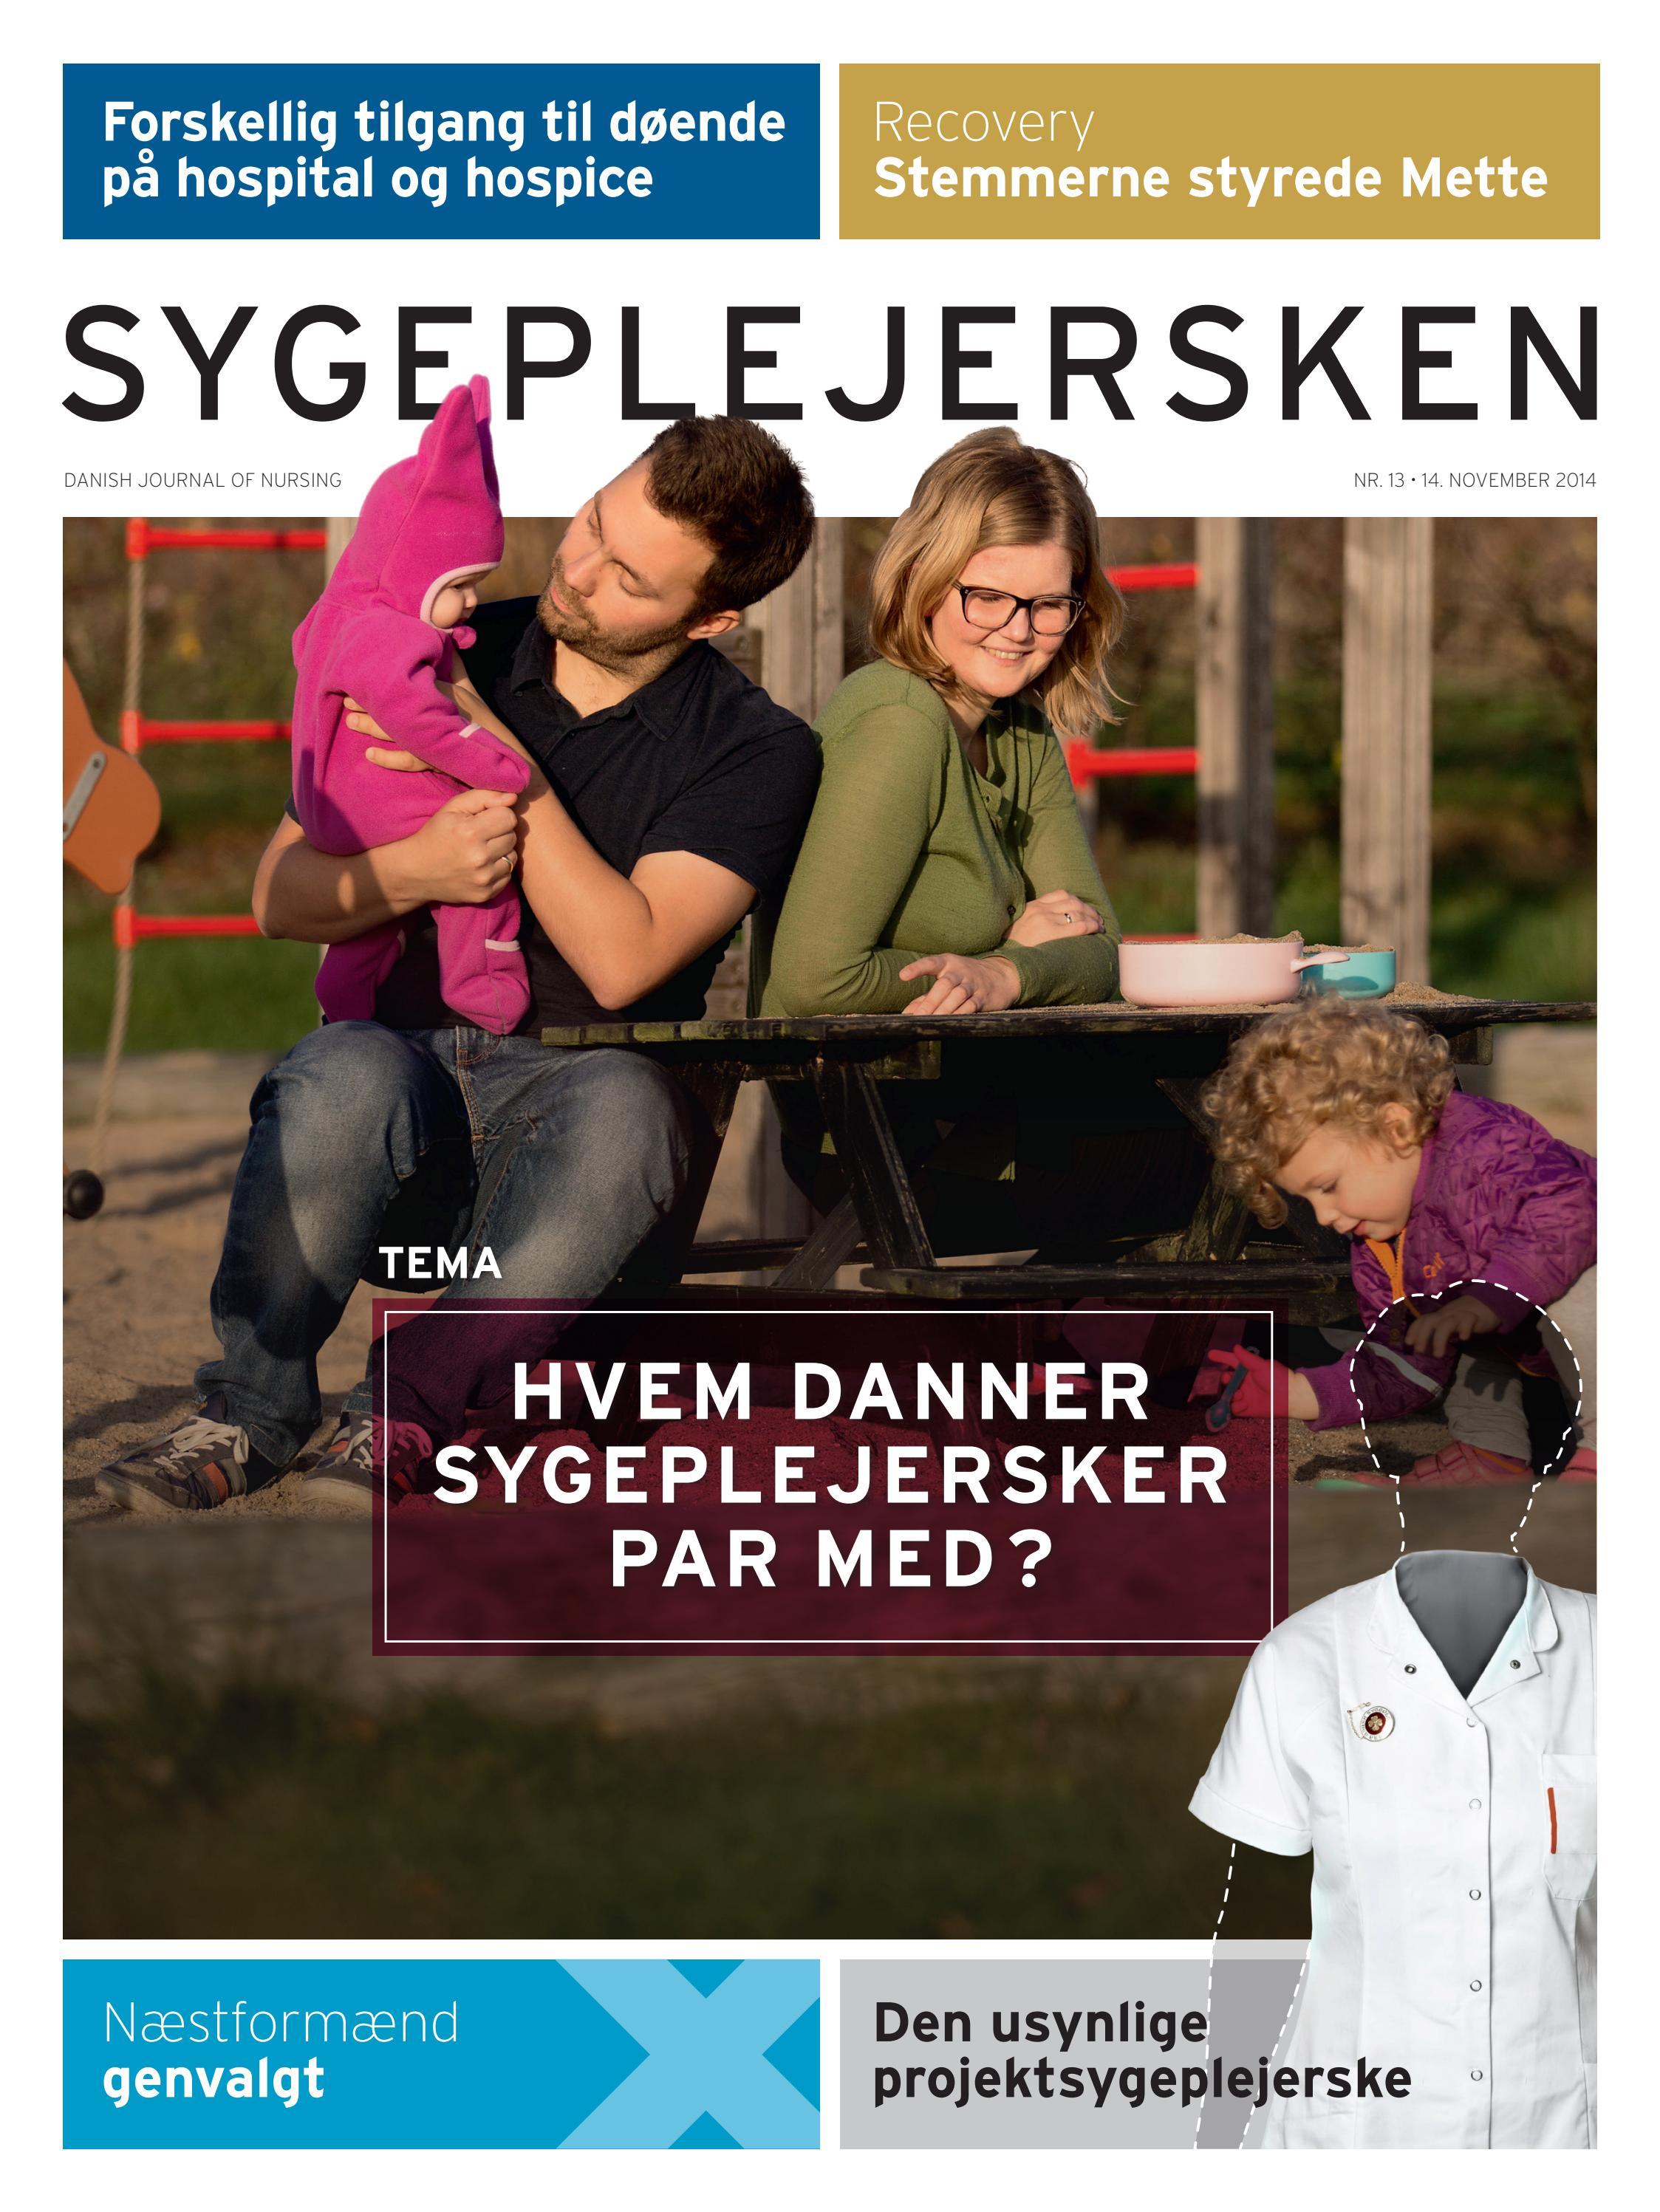 intime massage vestsjælland merete bøg pedersen